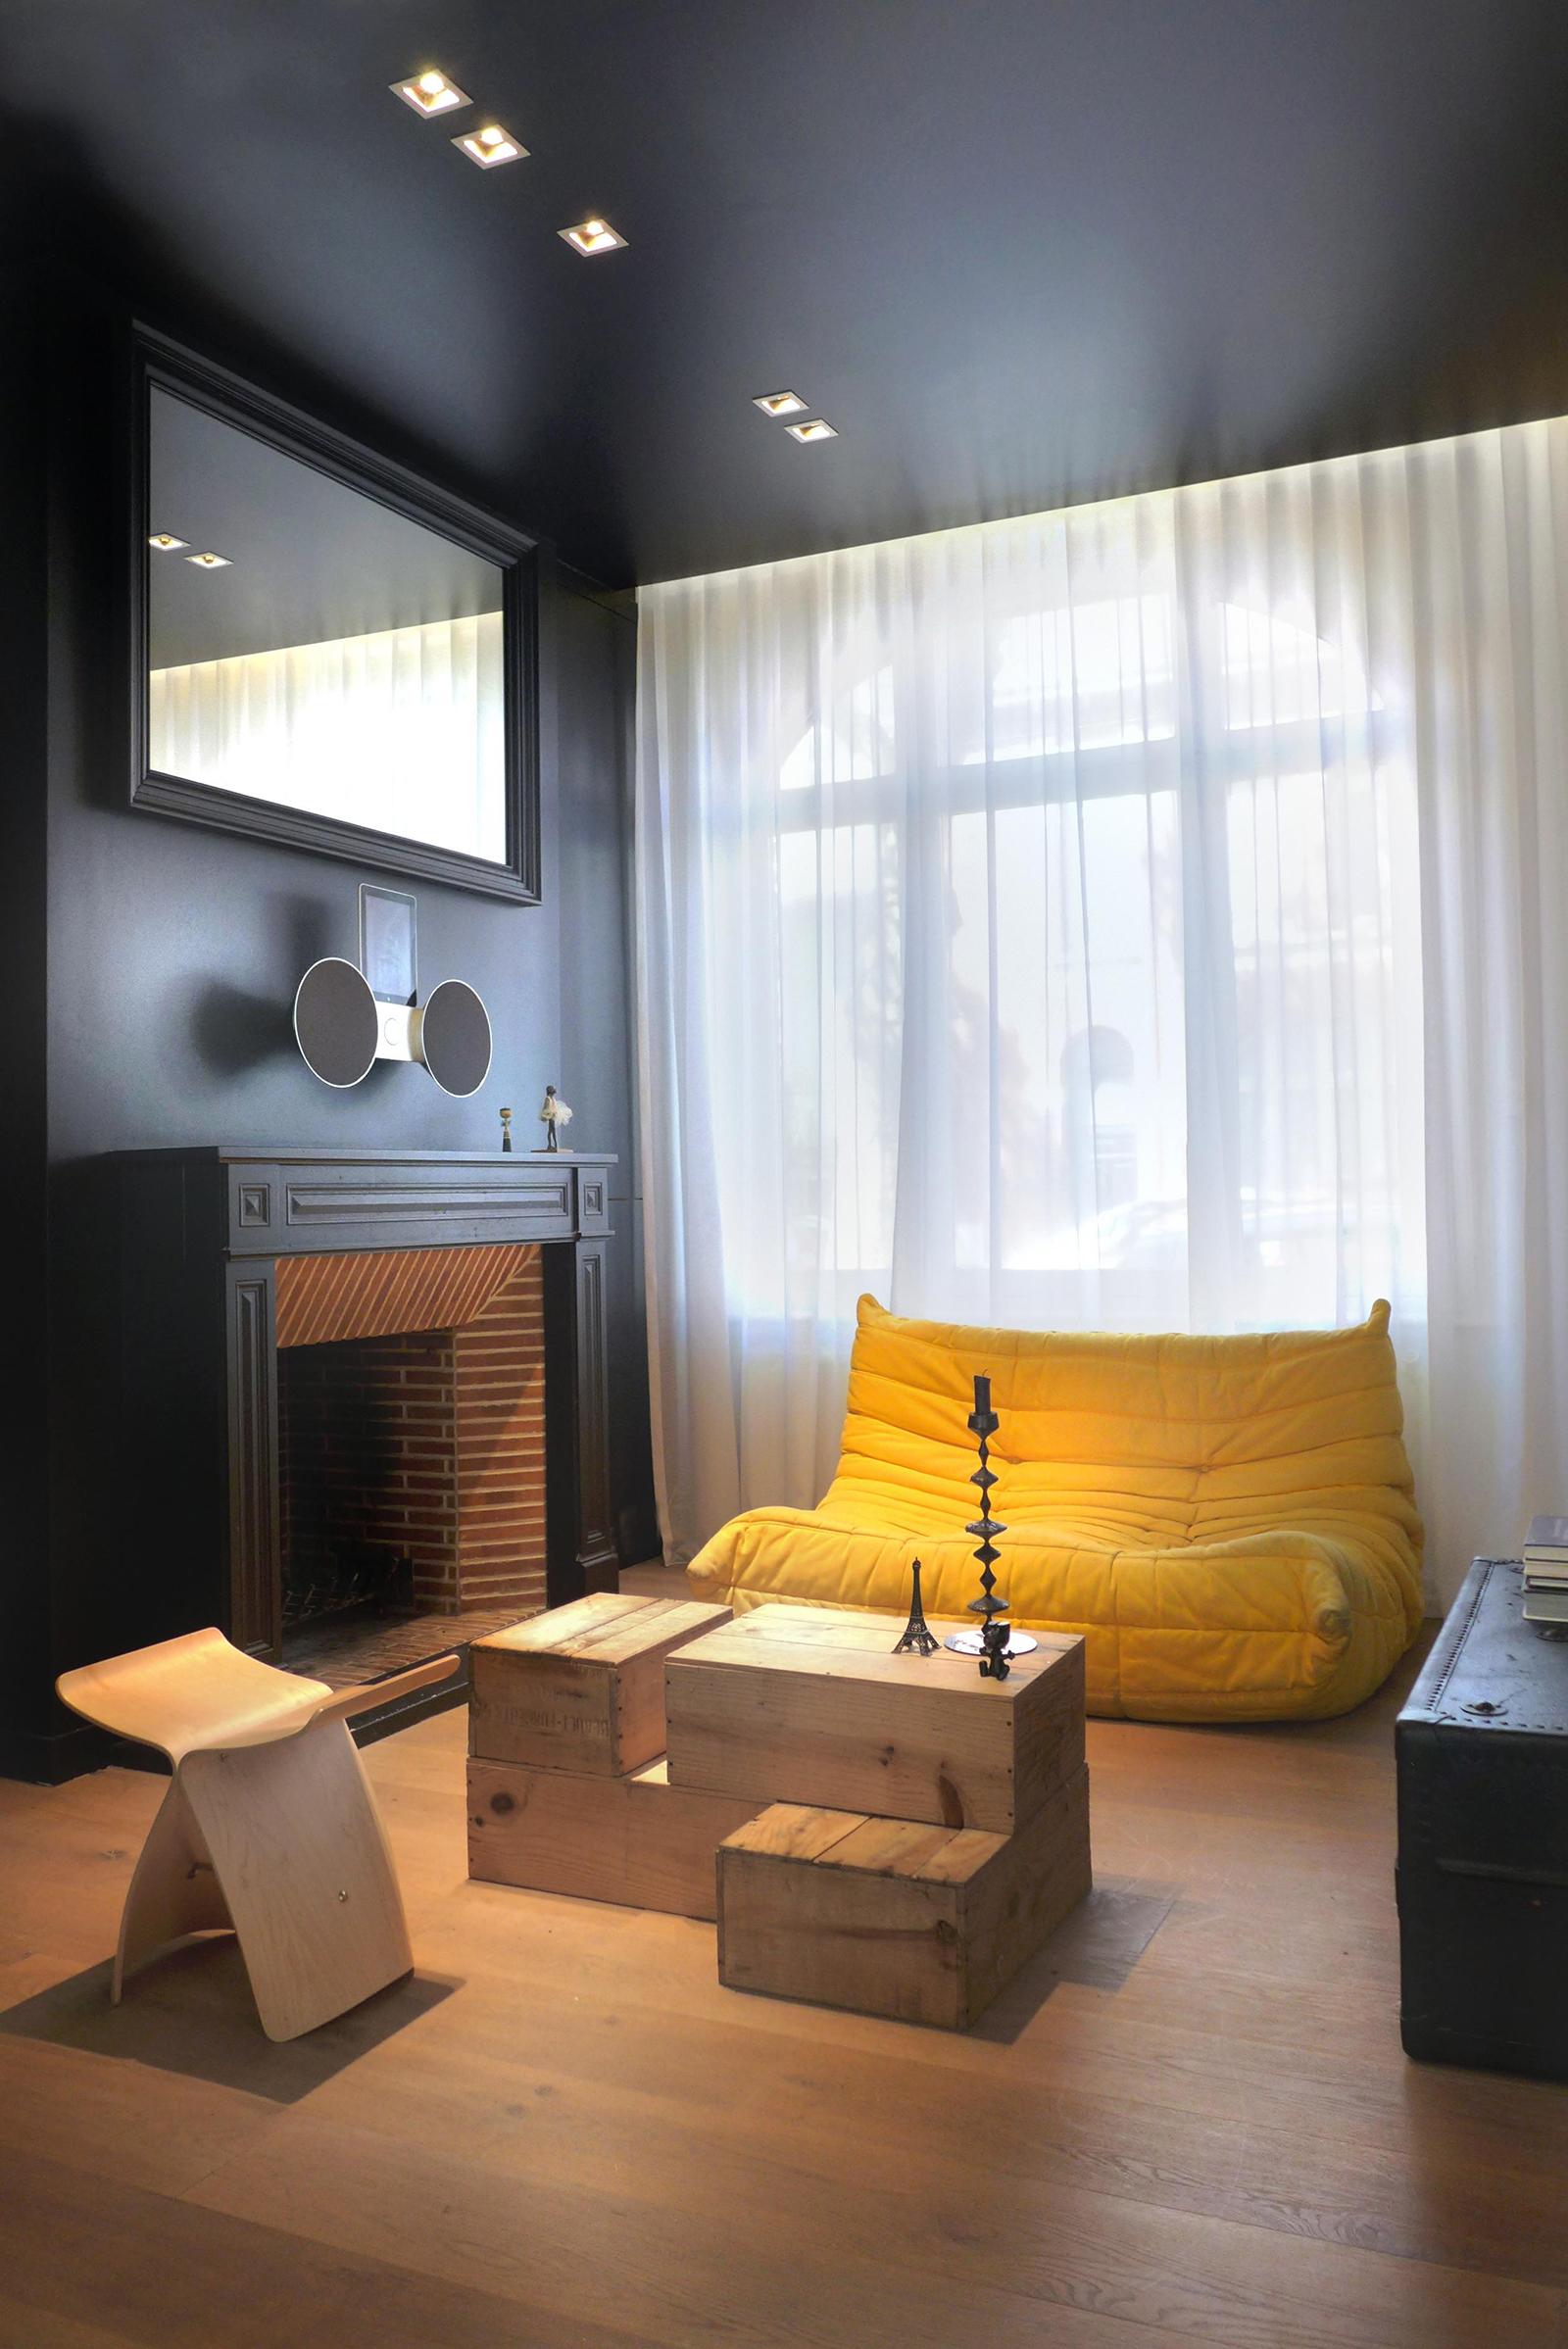 maison 1930 extension des possibles viving. Black Bedroom Furniture Sets. Home Design Ideas